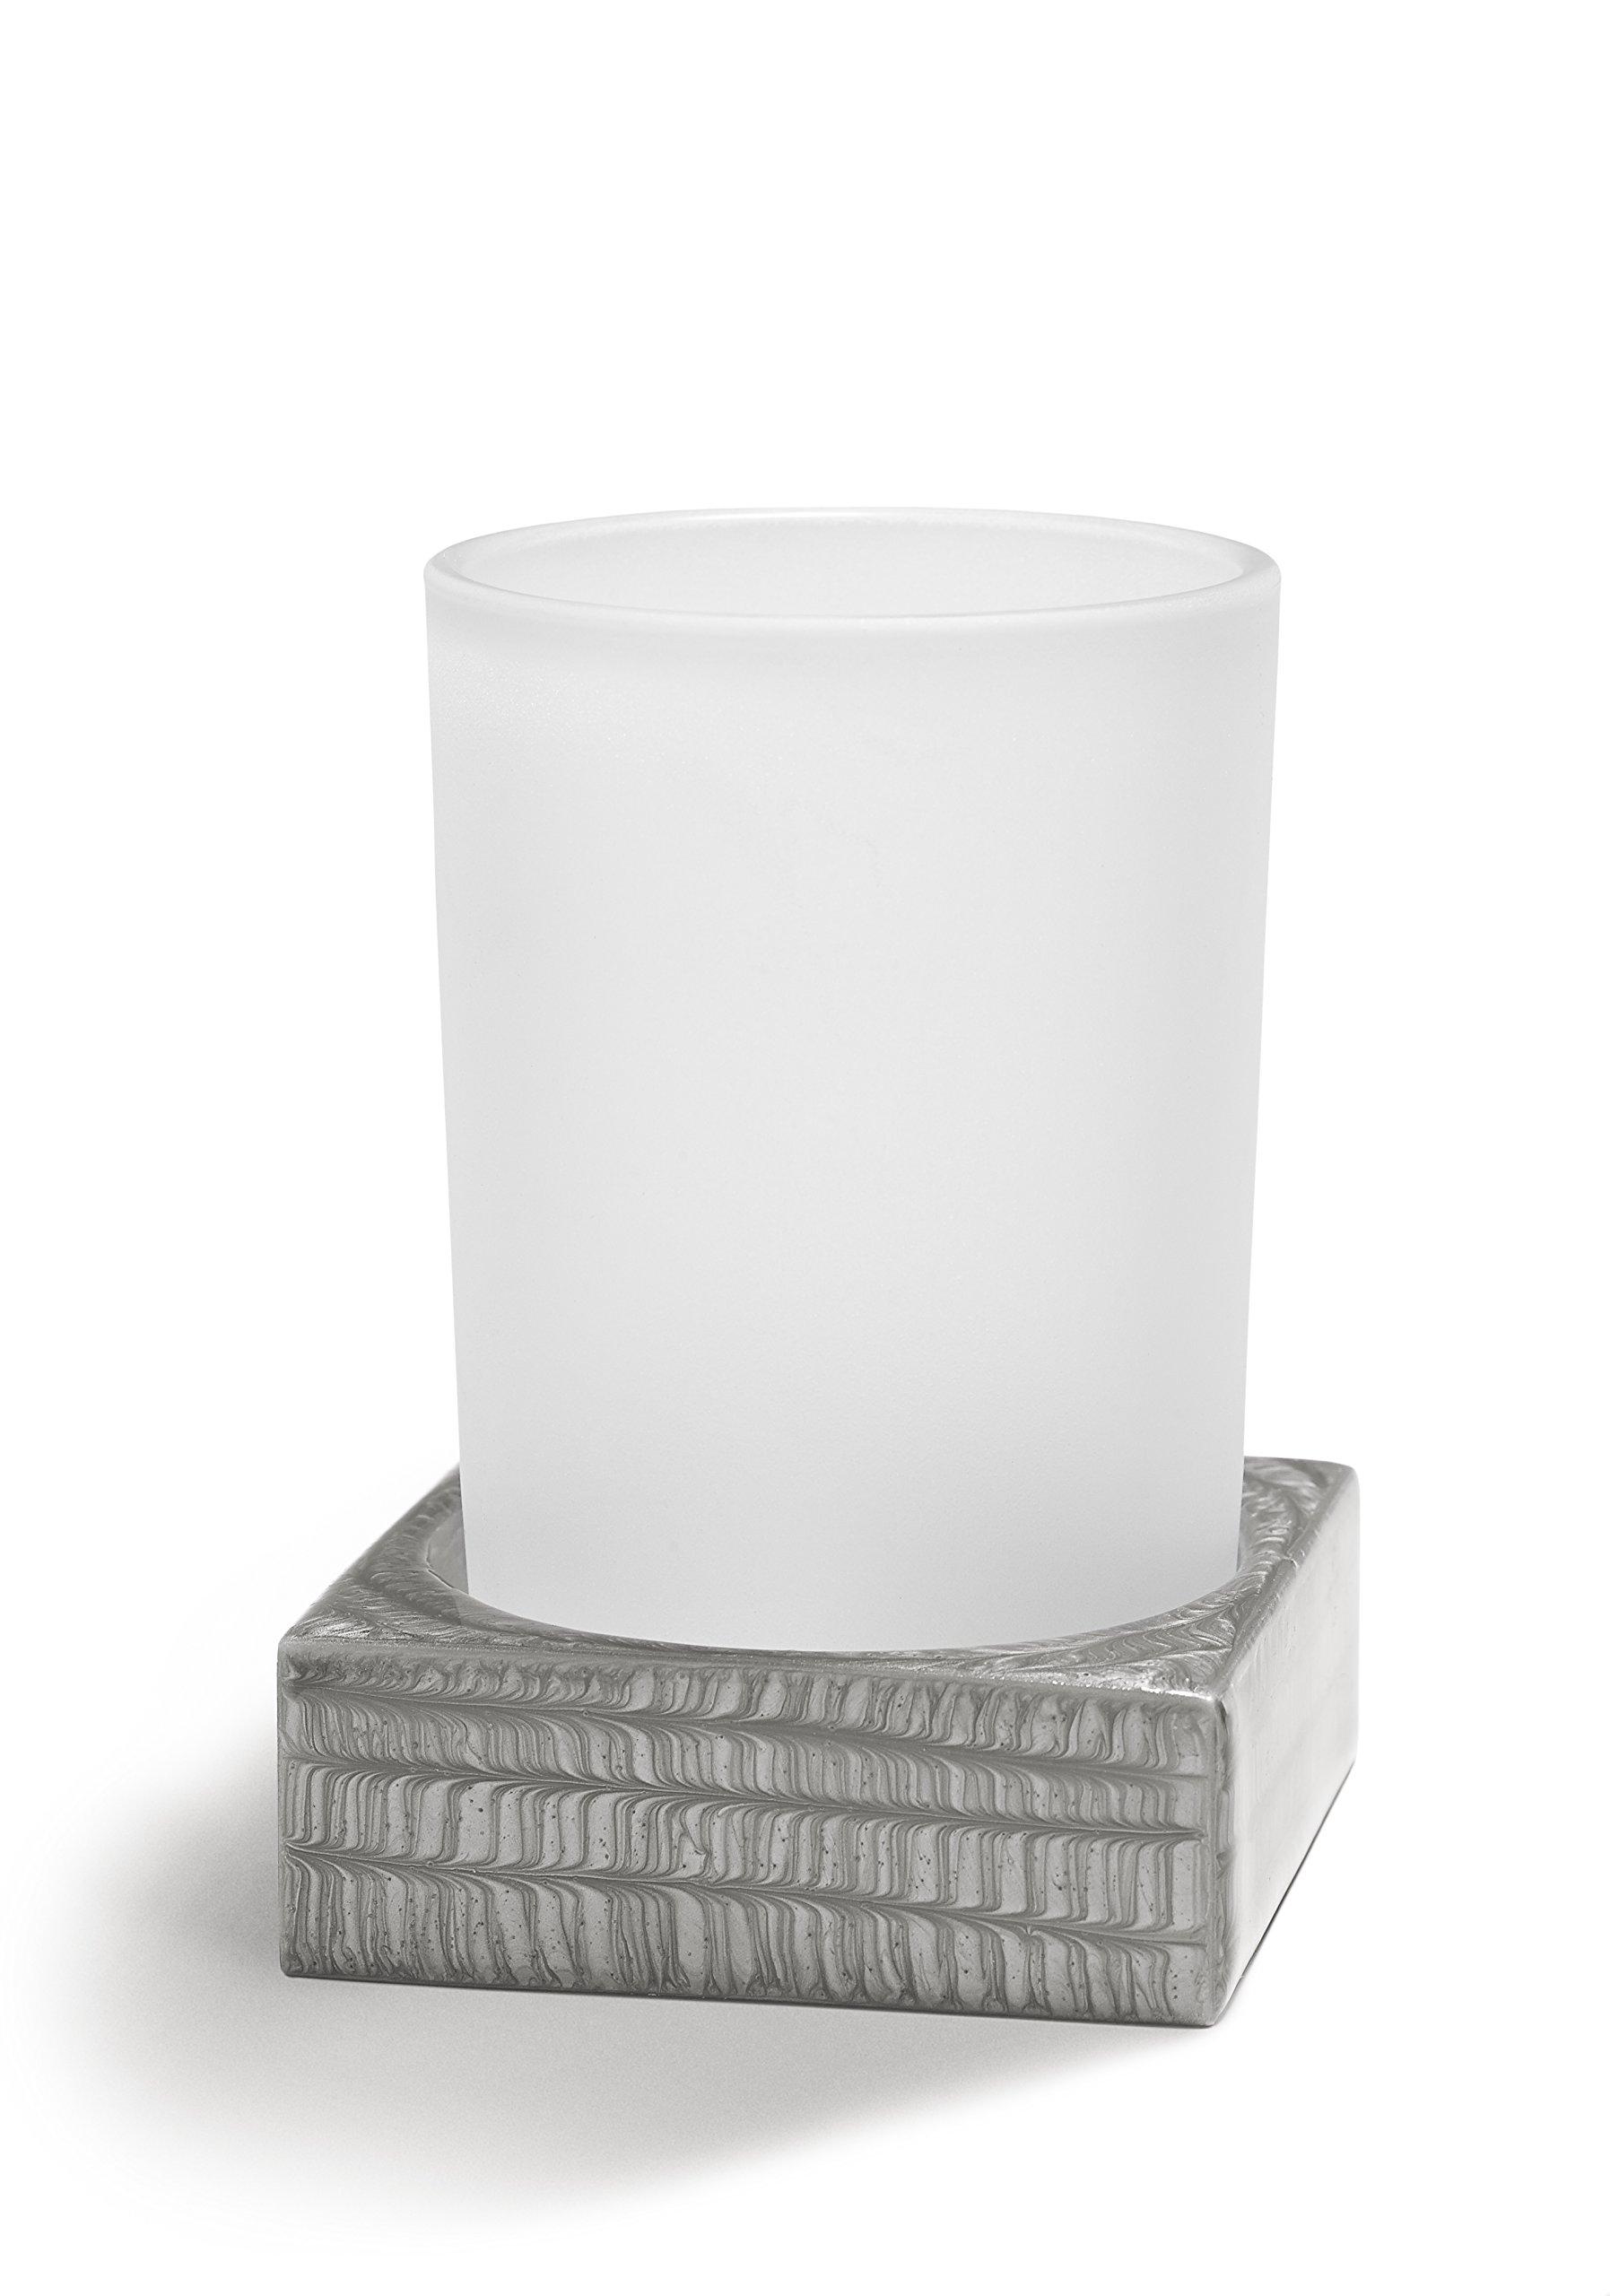 Kassatex Delano Bathroom Accessories (Tumbler, Grey) by Kassatex